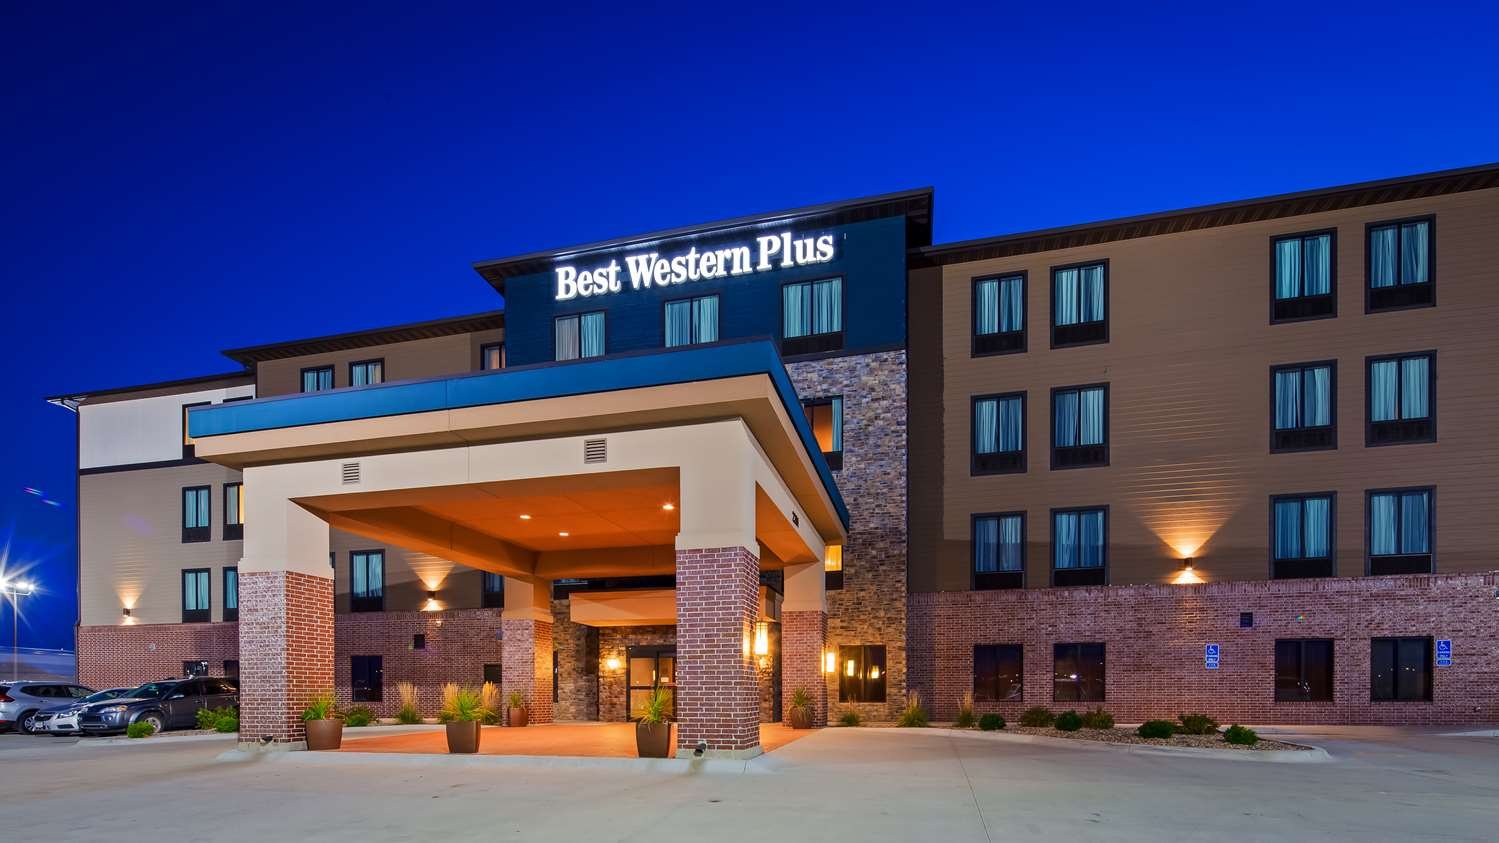 Lincoln Hotels Best Western Plus Inn Suites In